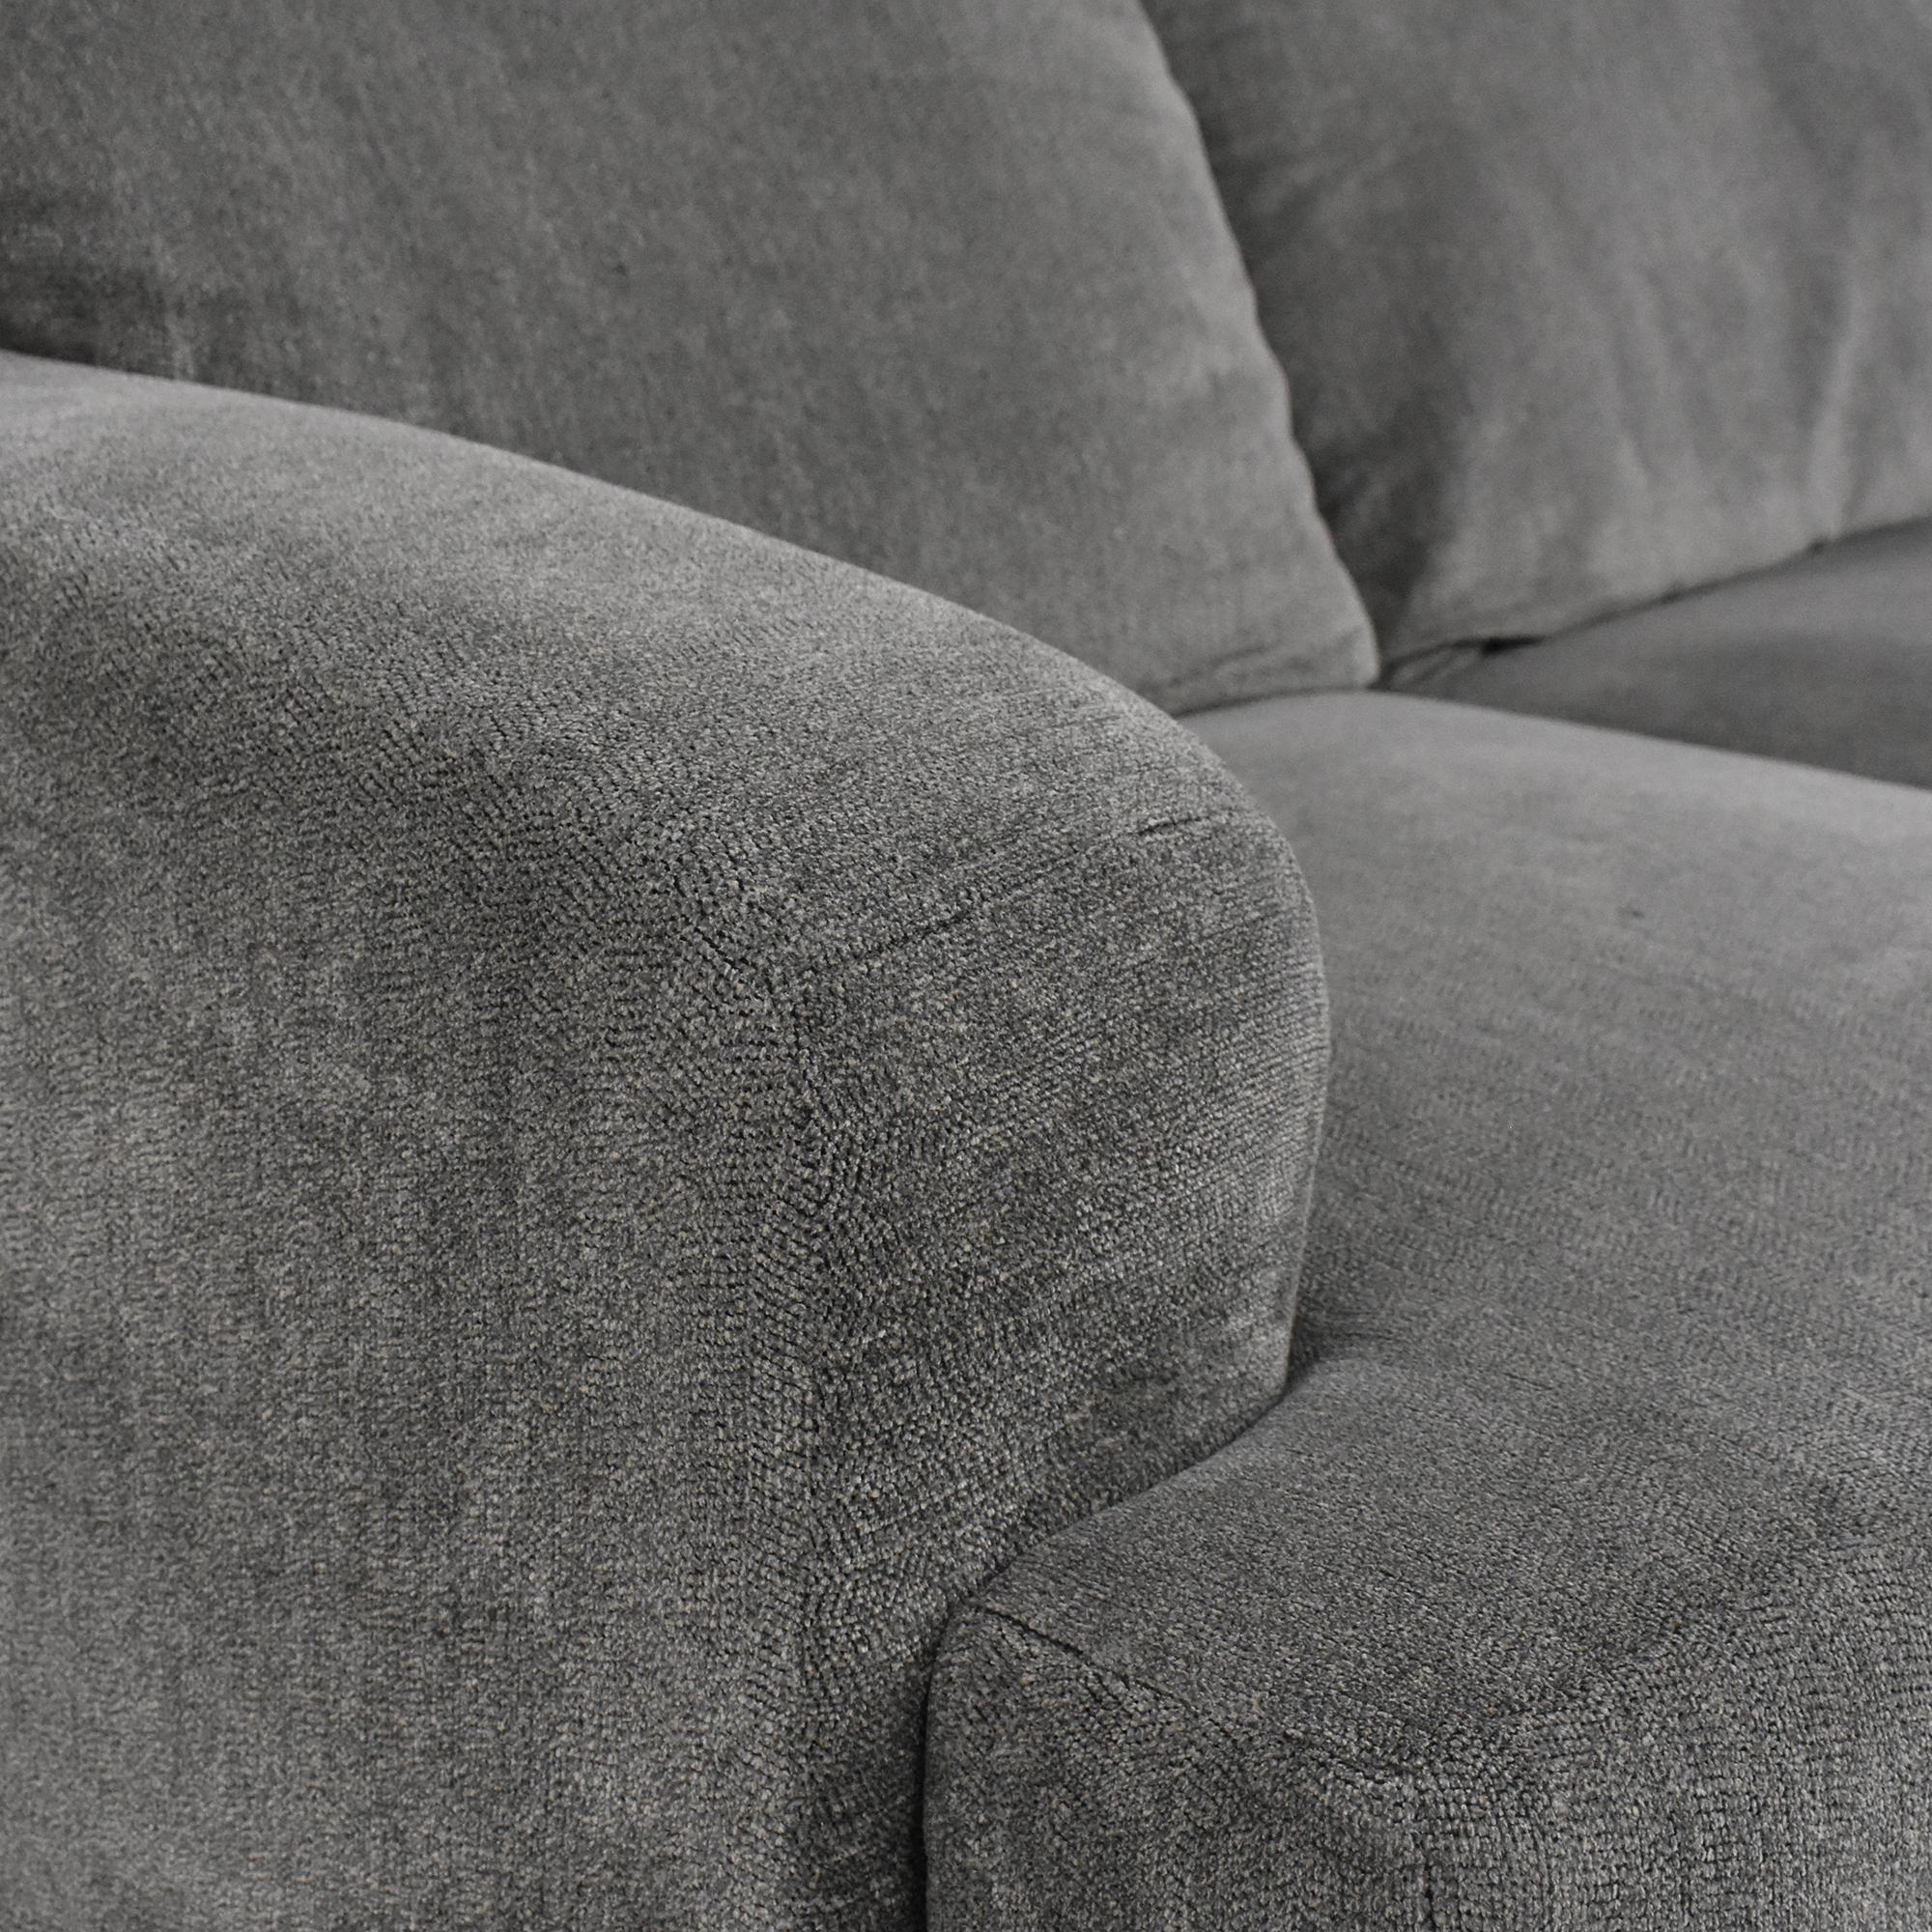 Raymour & Flanigan Raymour & Flanigan Two Cushion Sofa coupon